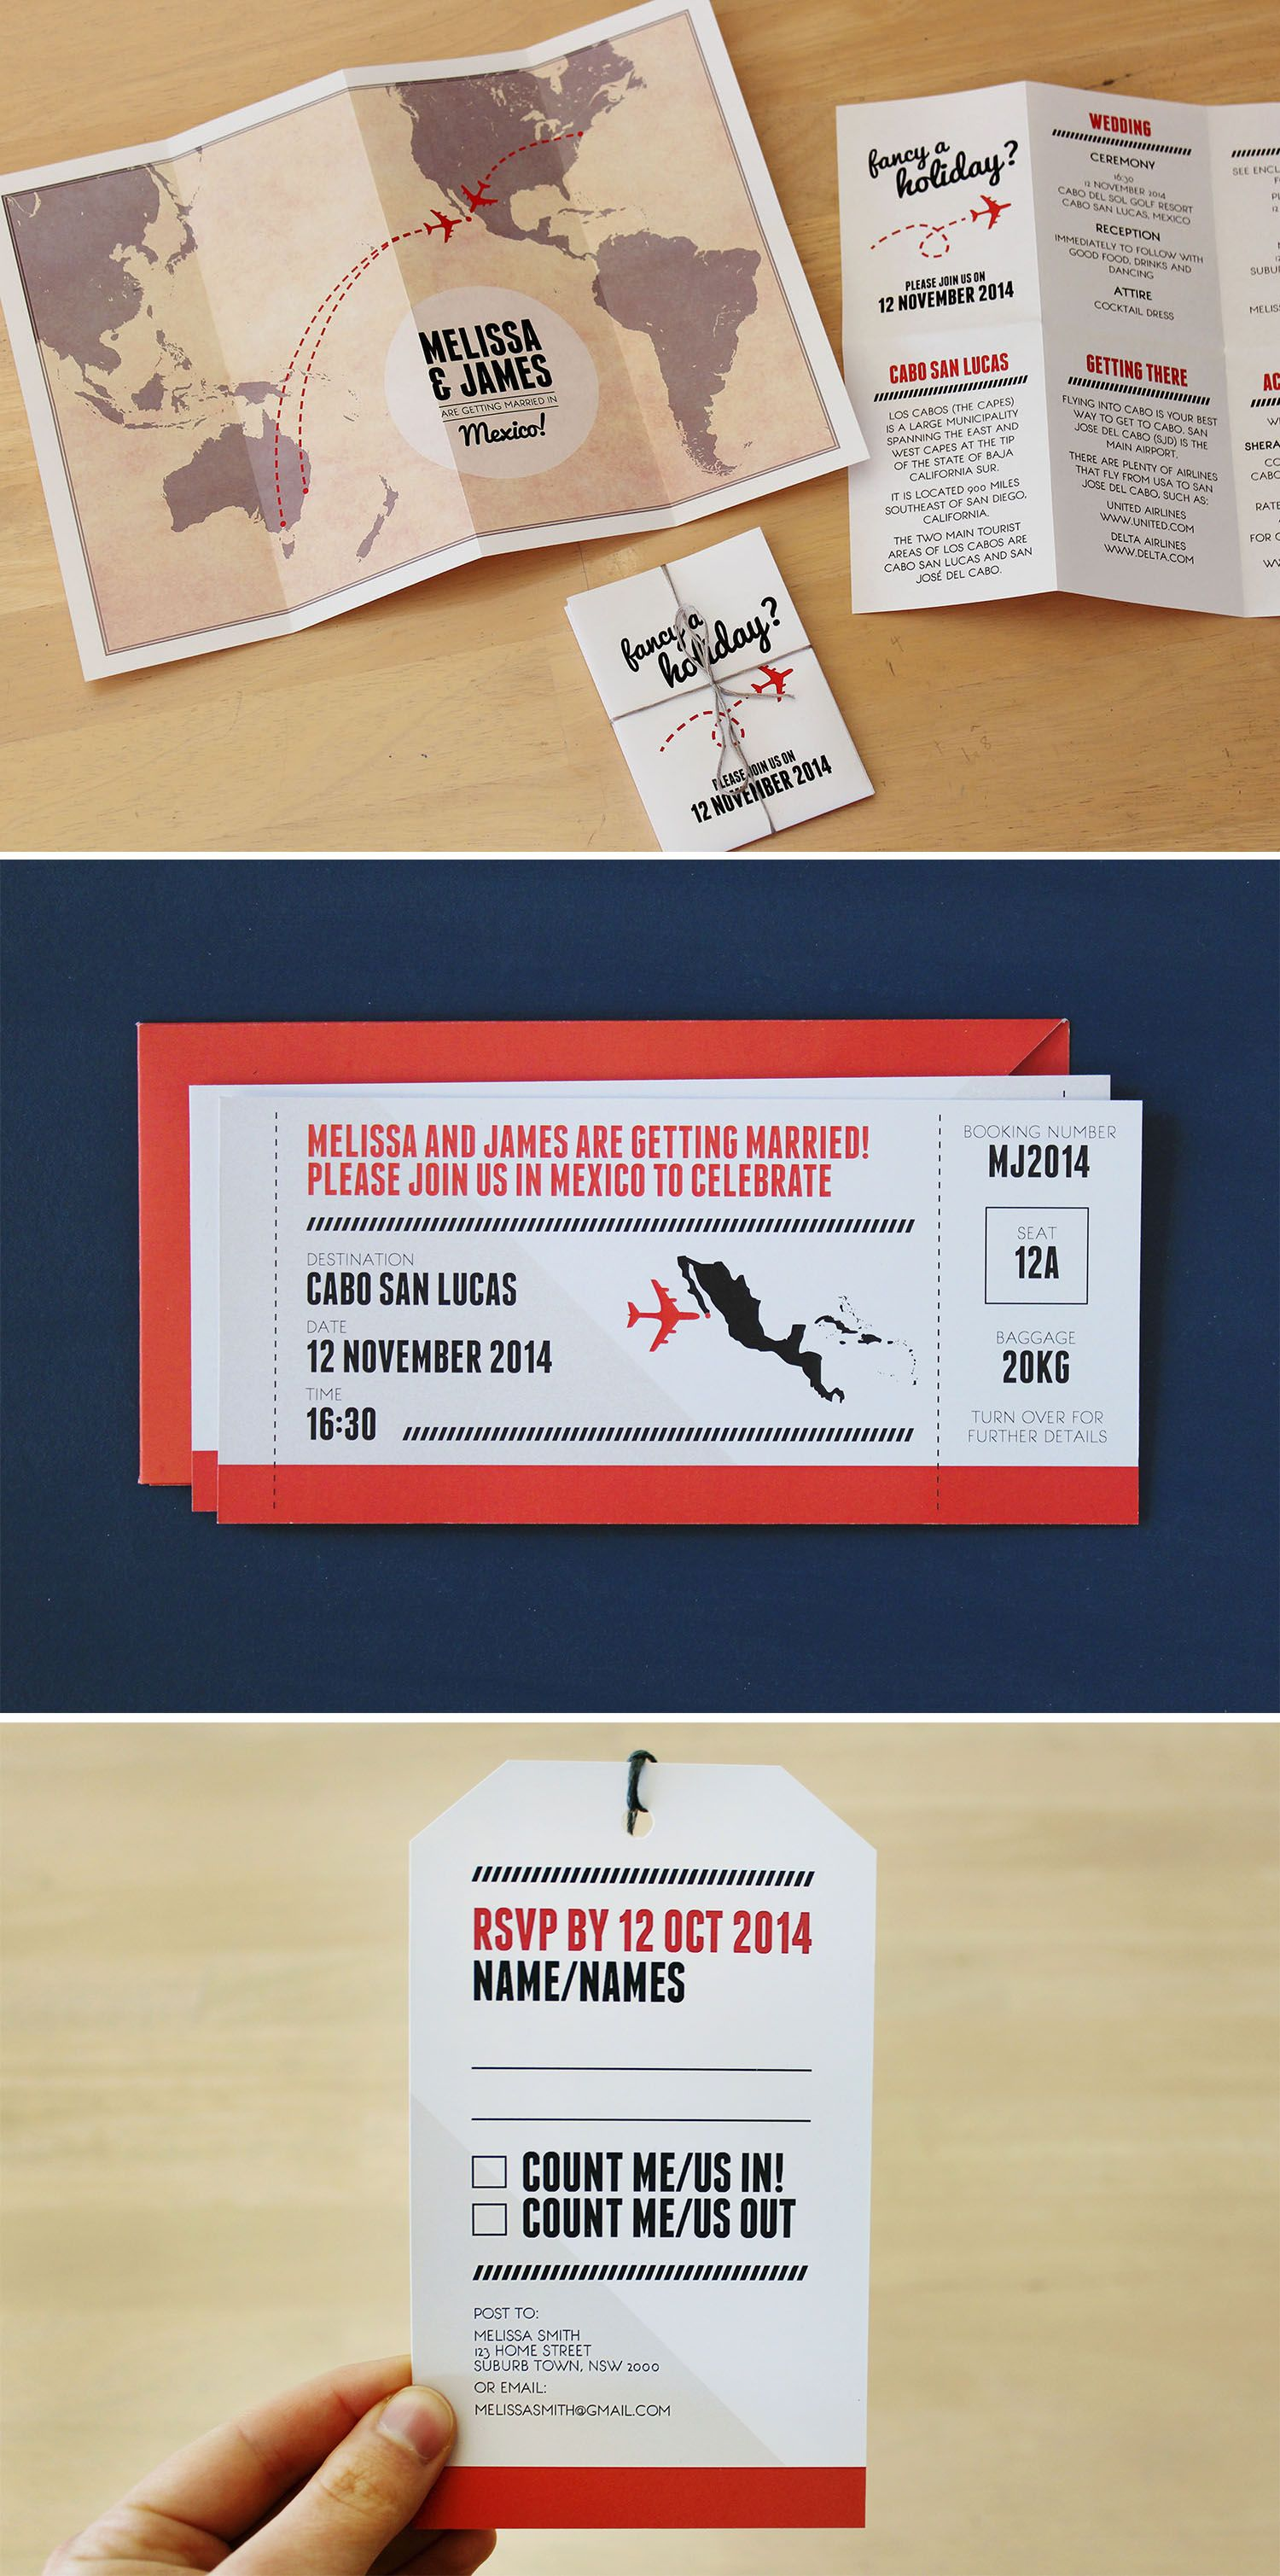 Diy Printable Stationery Set For A Destination Wedding Includes Map